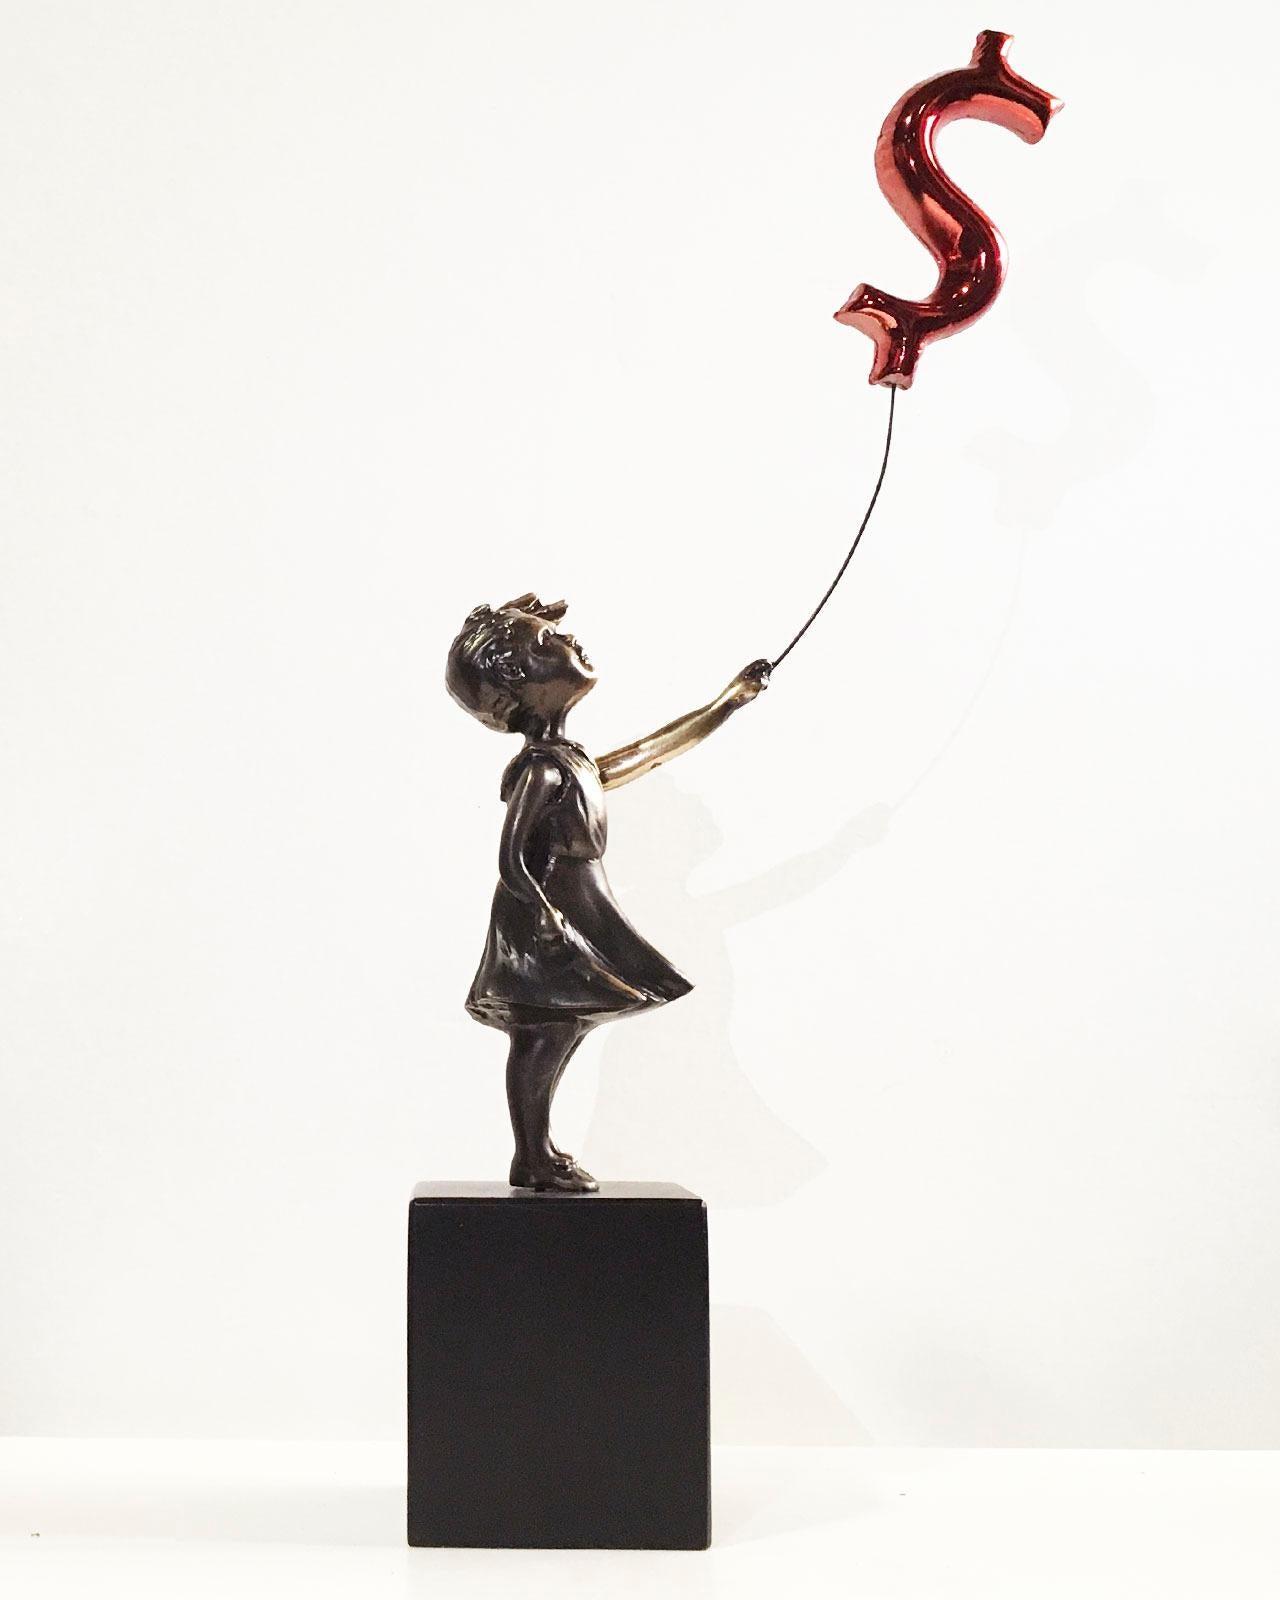 Girl with balloon dollar - Miguel Guía Street Art Cast bronze Sculpture